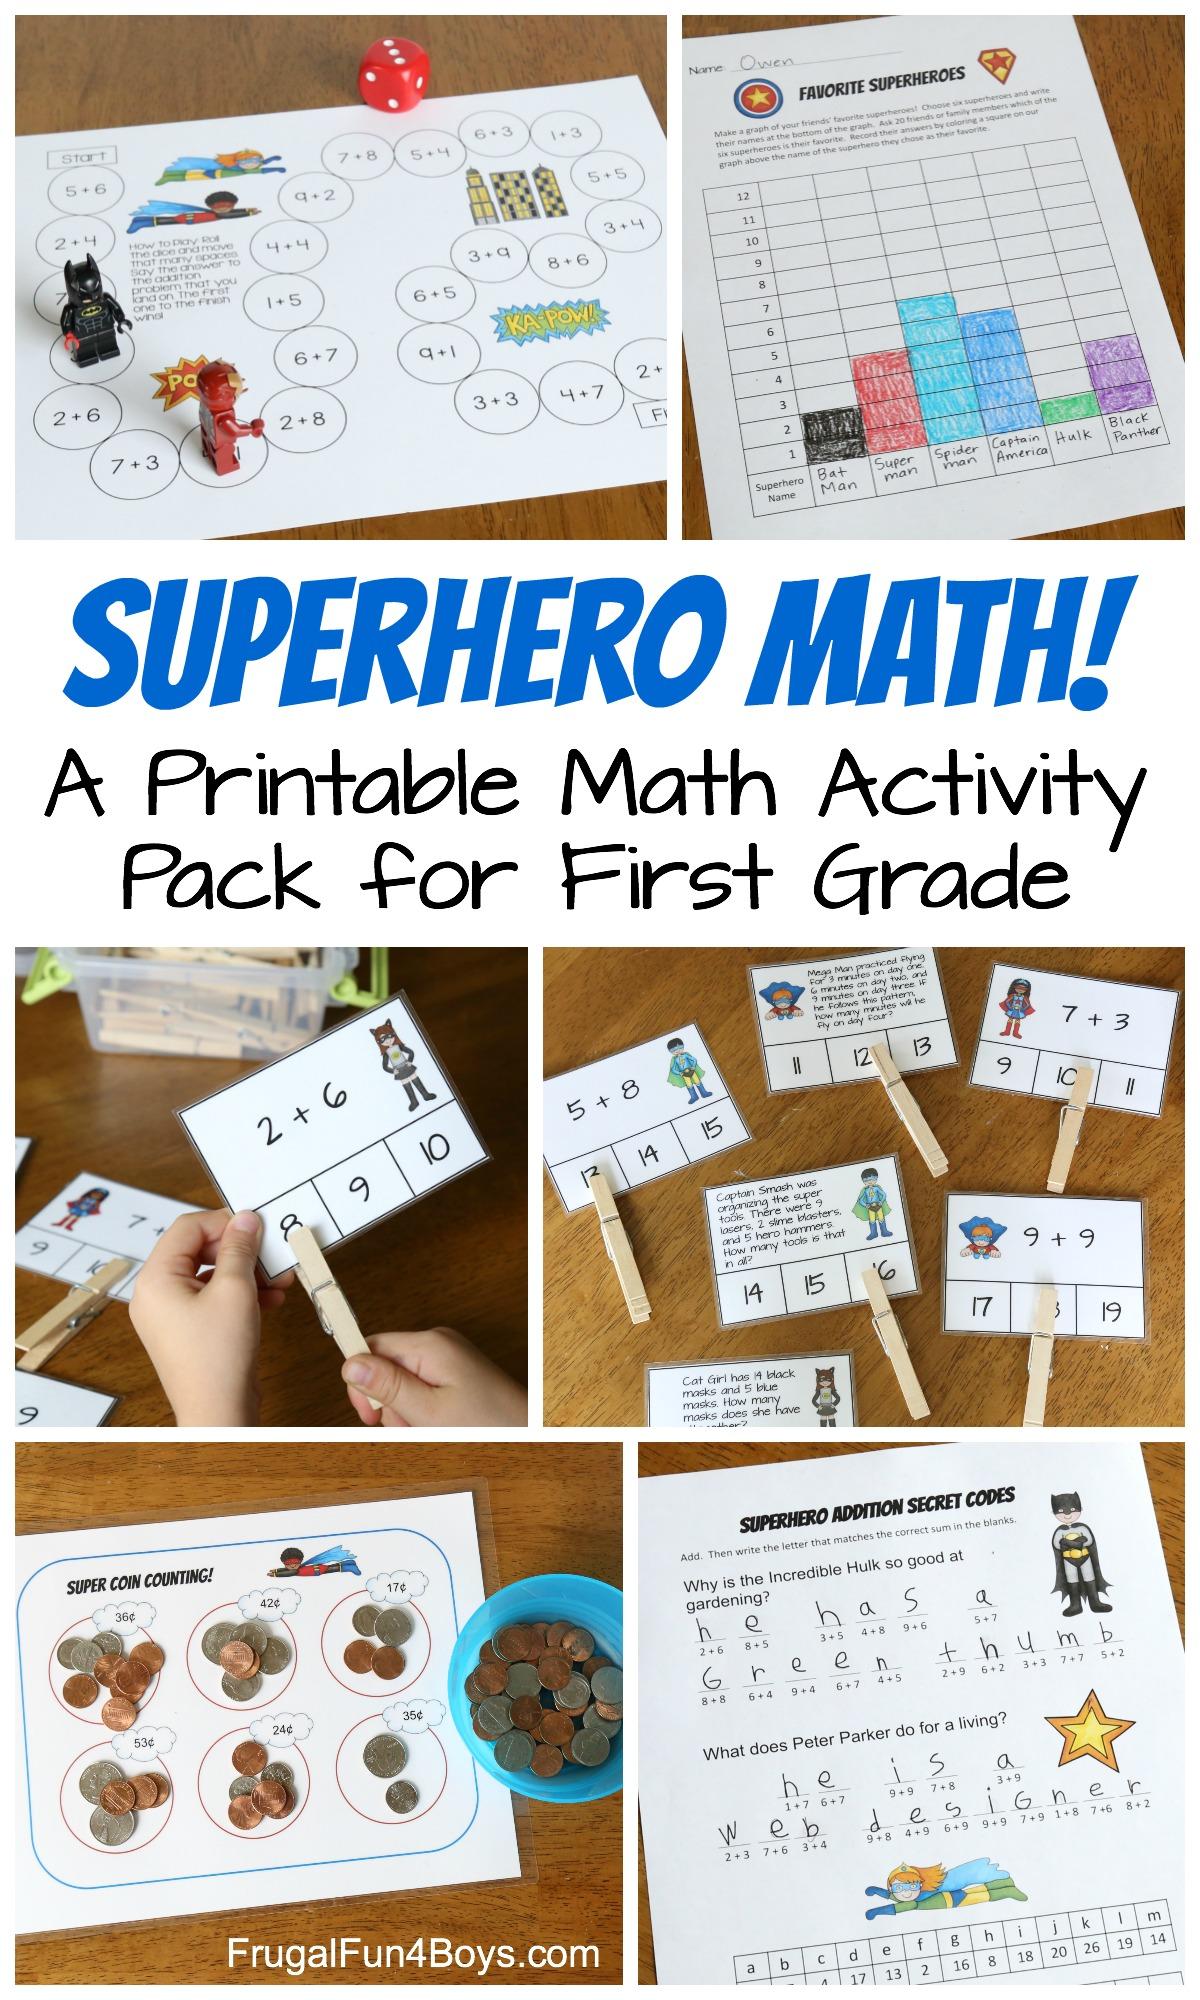 Superhero Math A Printable Math Activity Pack For First